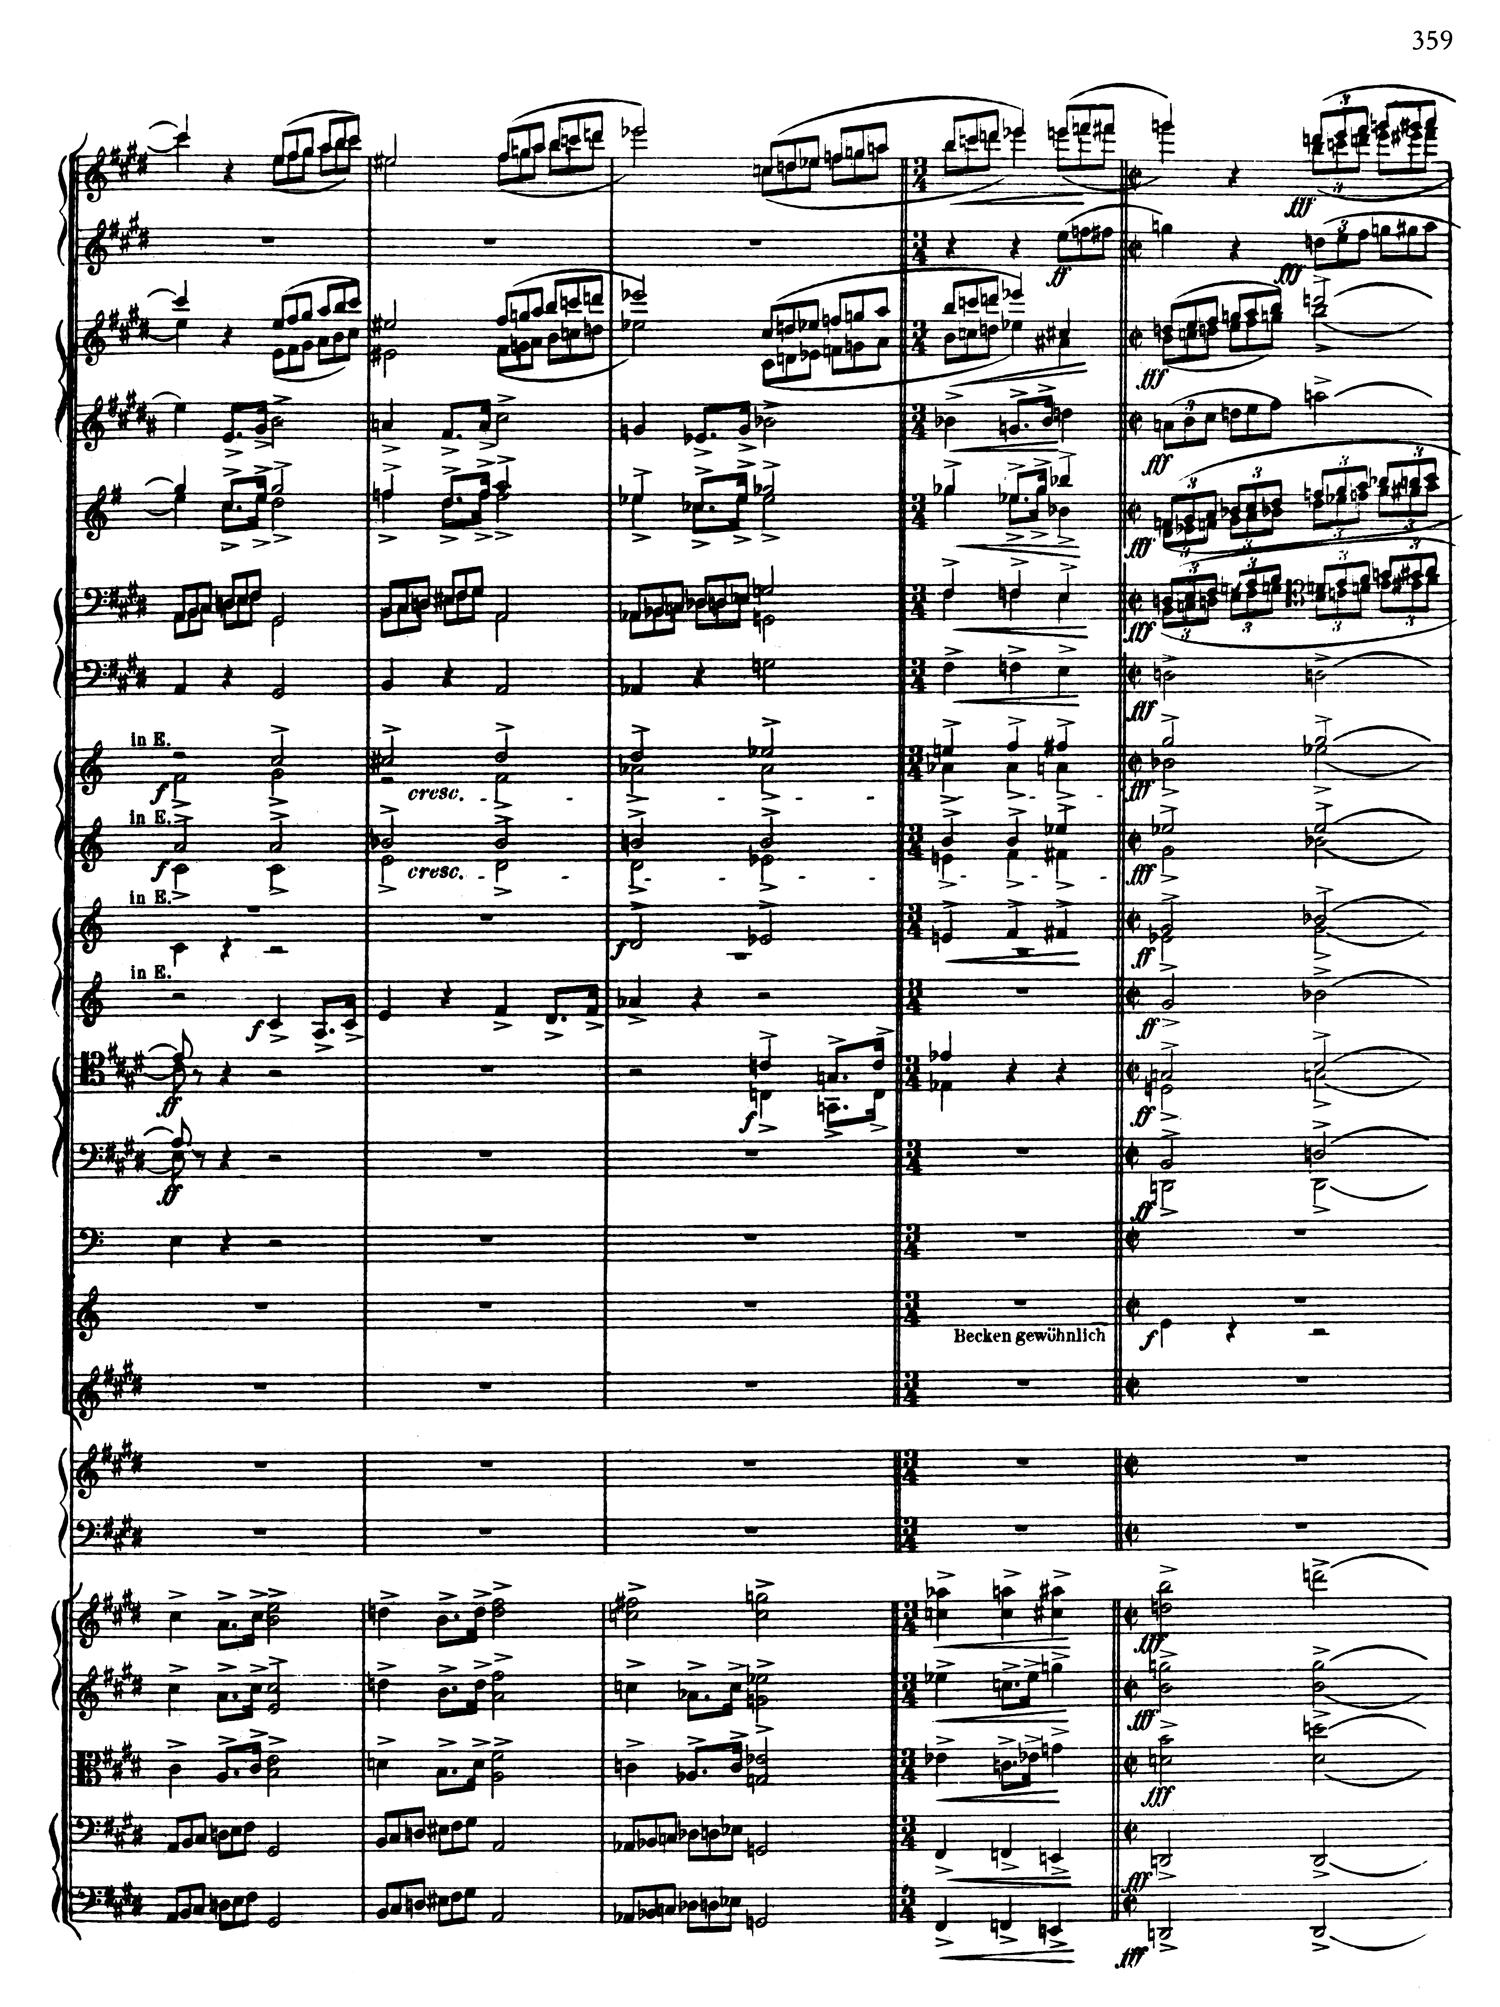 Strauss Don Juan Score 2.jpg